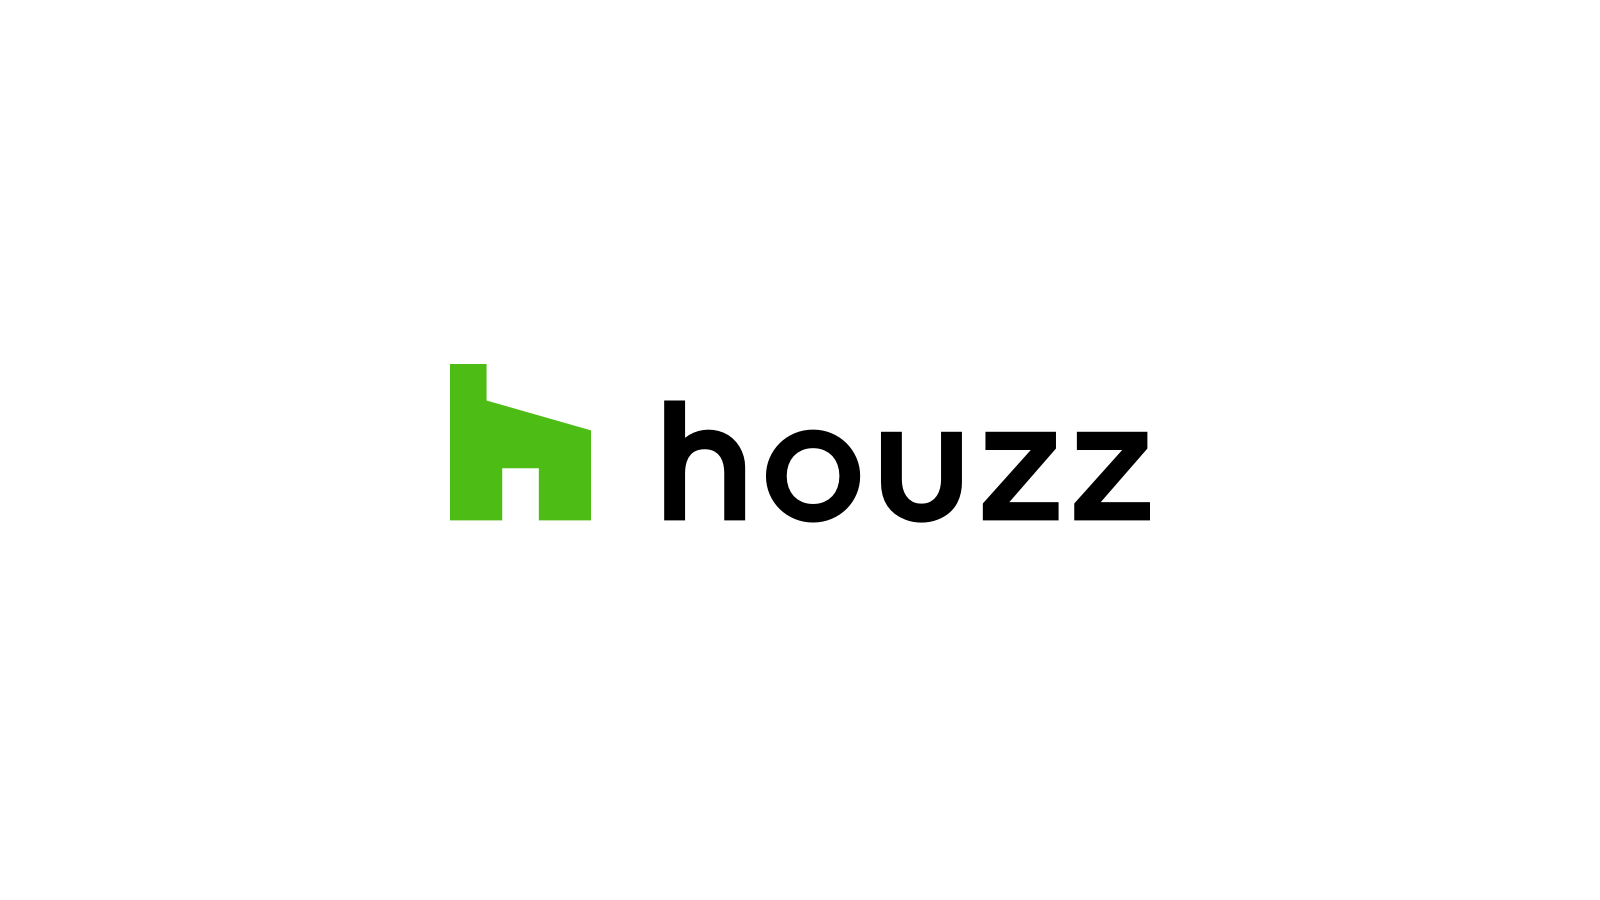 houzz_logo_redesign1.jpg